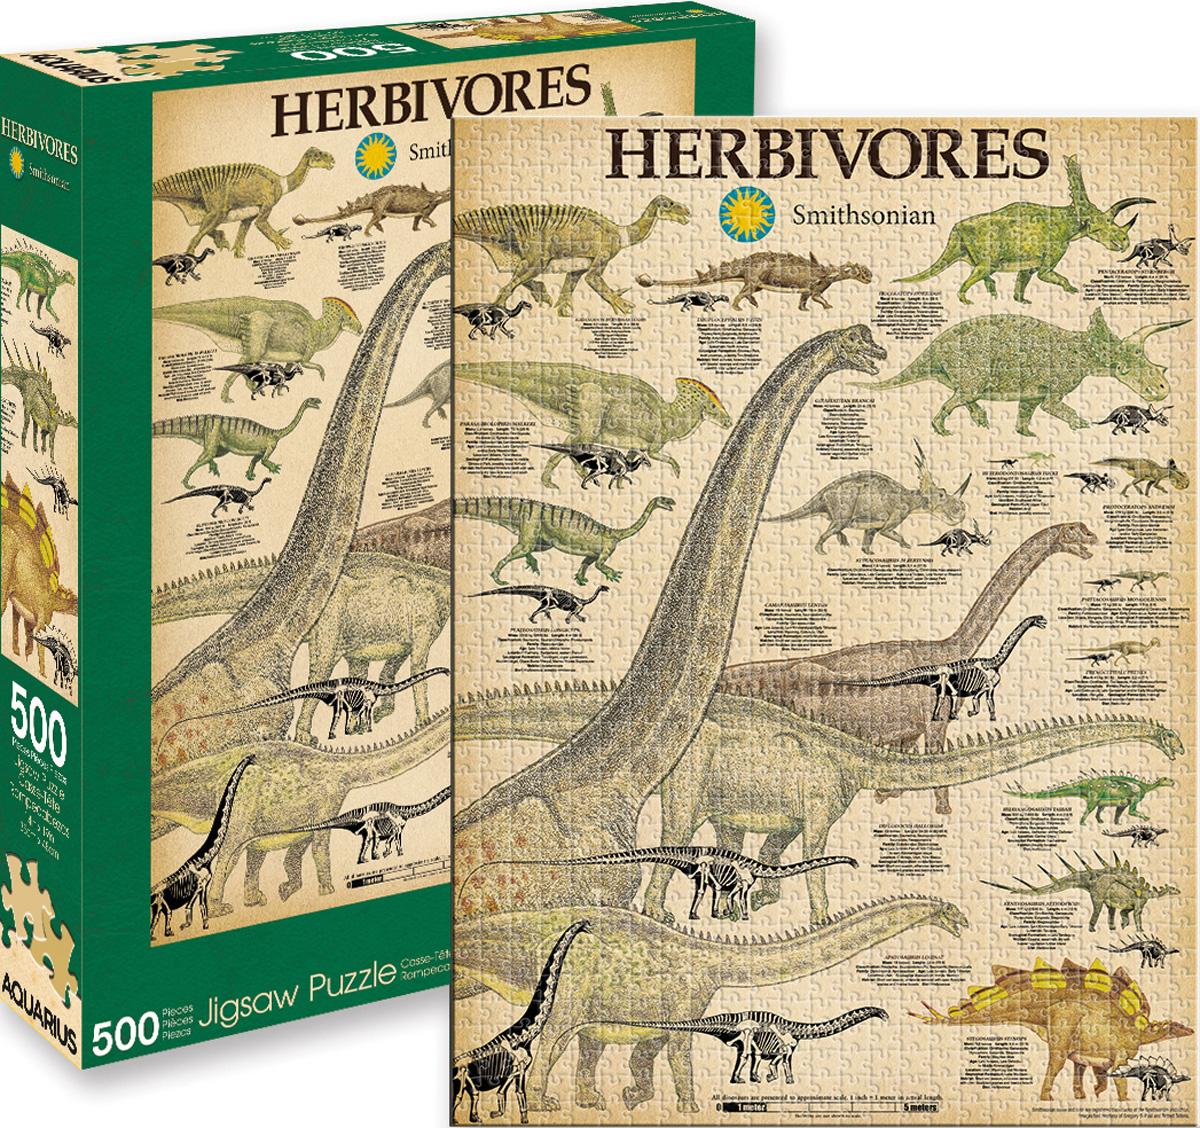 Smithsonian Herbivores Dinosaurs Jigsaw Puzzle